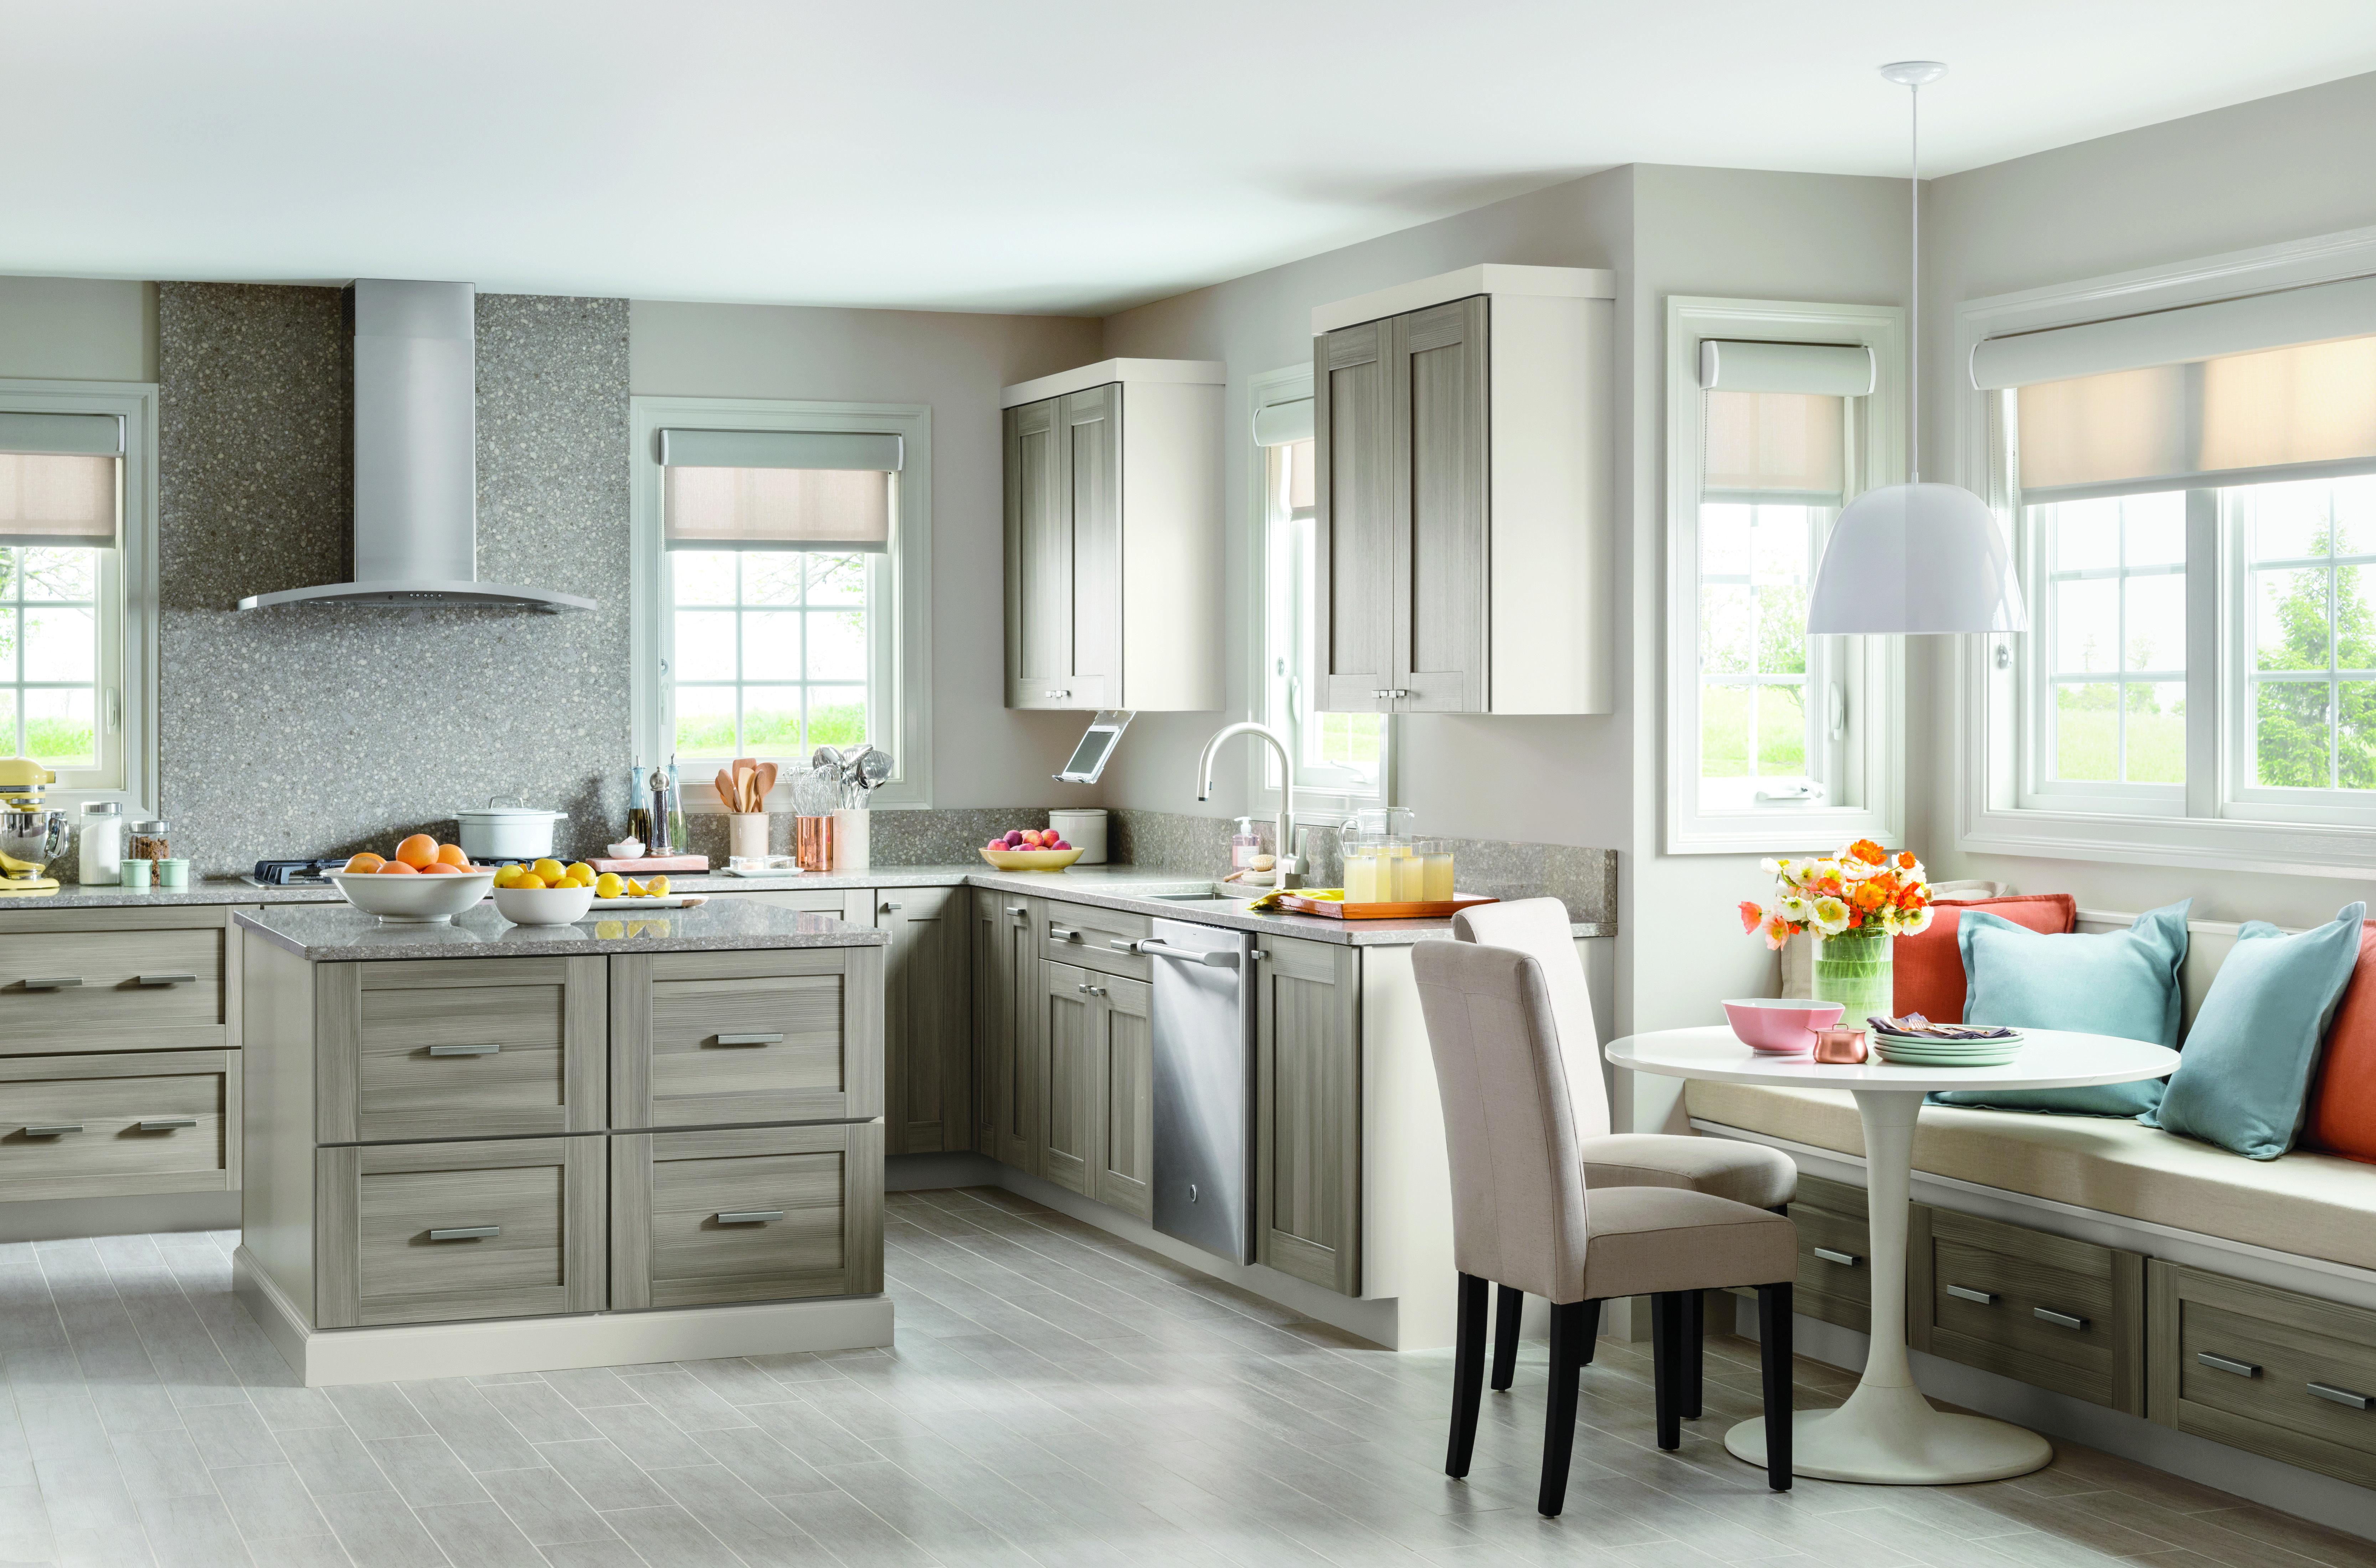 7 Steps To Your Dream Kitchen Kitchen Remodel Small Kitchen Design New Kitchen Designs